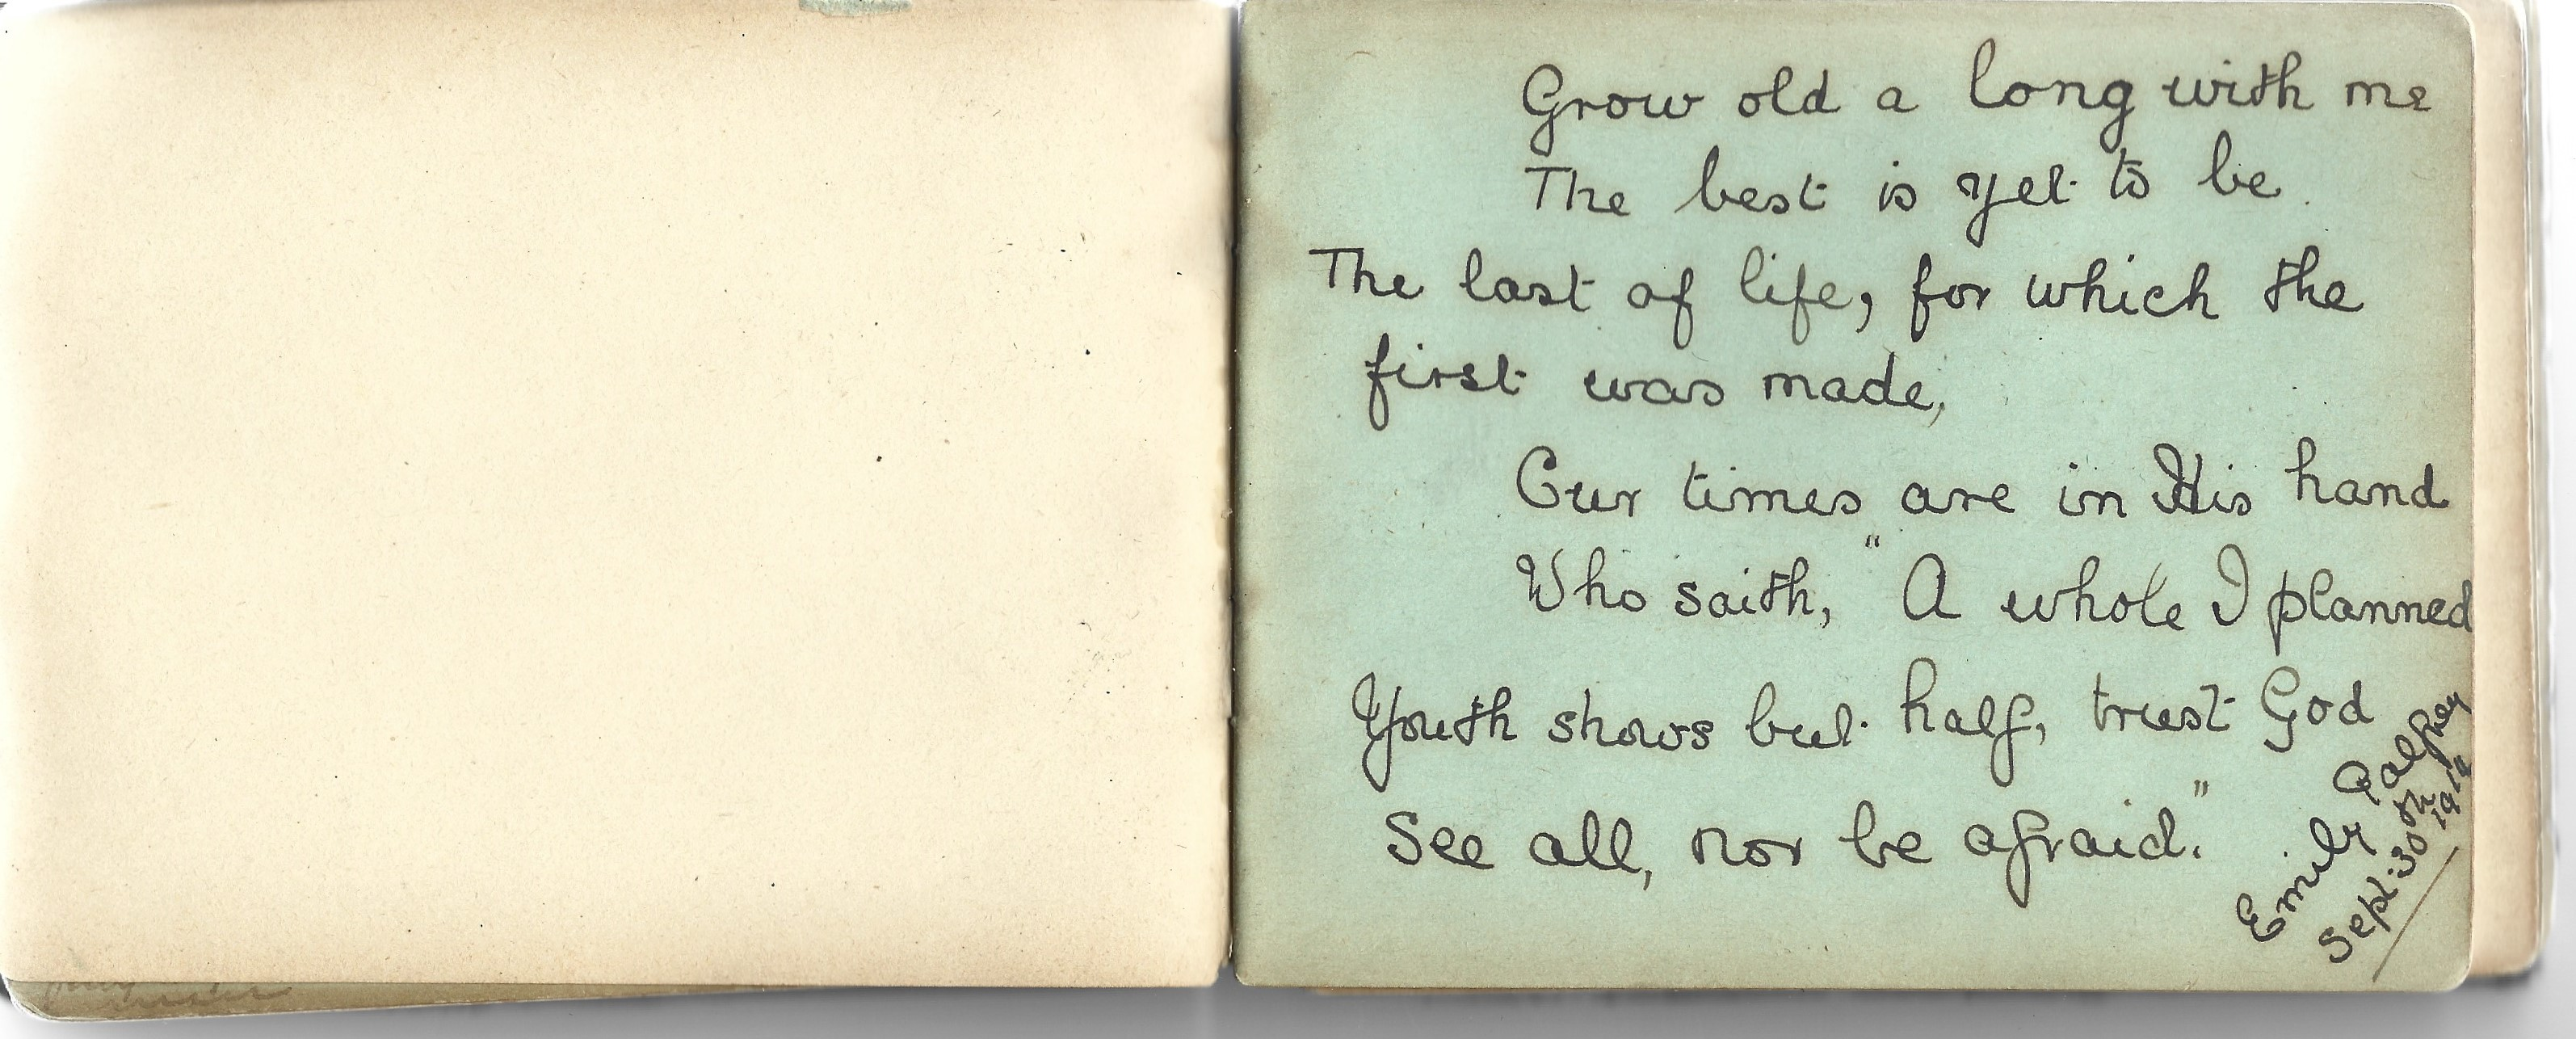 A World War 1 era autograph album, mostly comprising poignant poems and verses, a few original - Image 5 of 8